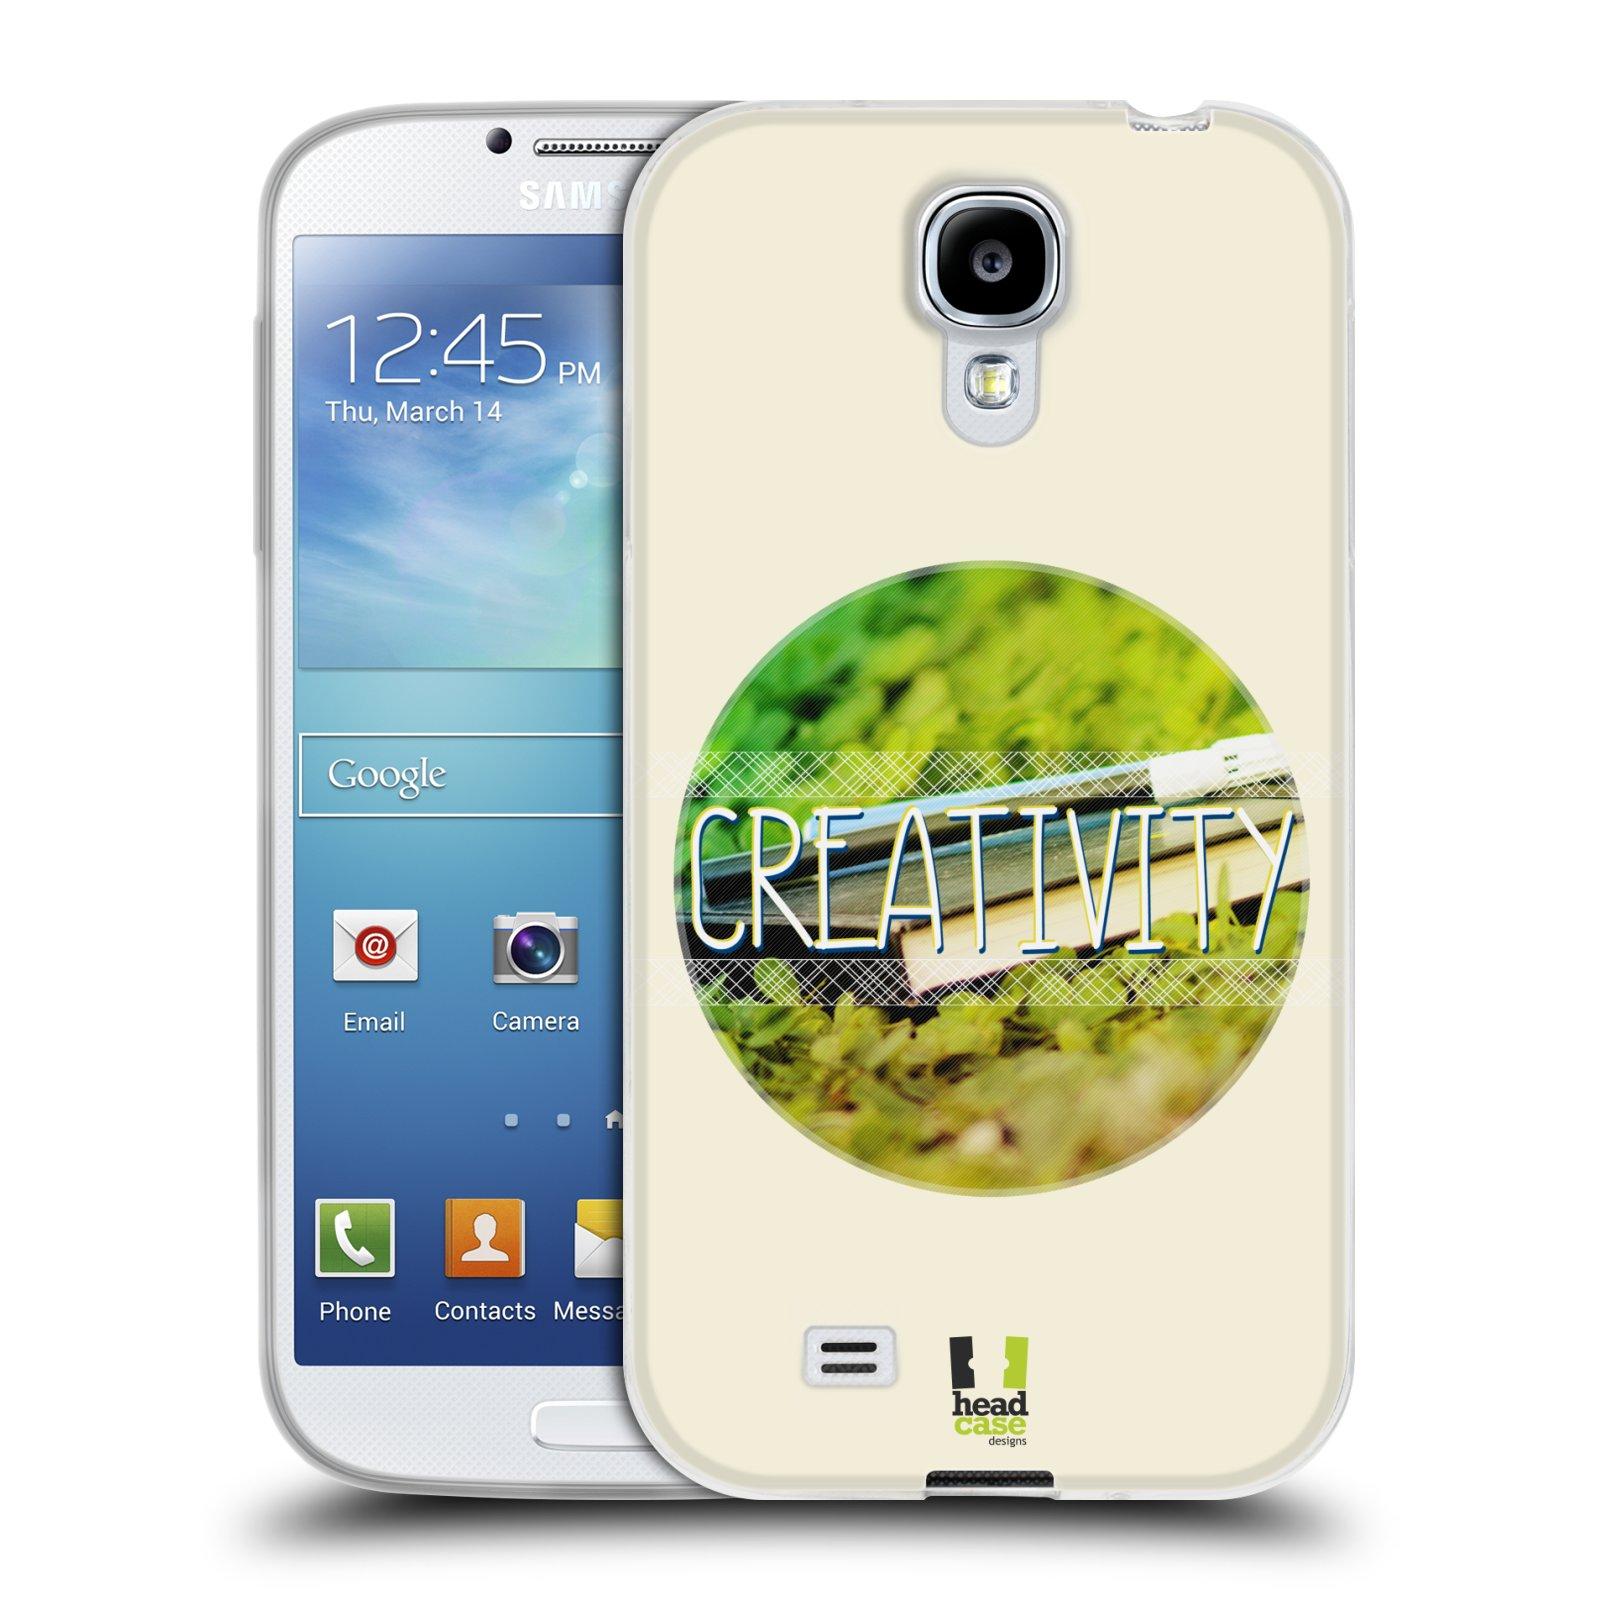 Silikonové pouzdro na mobil Samsung Galaxy S4 HEAD CASE INSPIRACE V KRUHU KREATIVITA (Silikonový kryt či obal na mobilní telefon Samsung Galaxy S4 GT-i9505 / i9500)